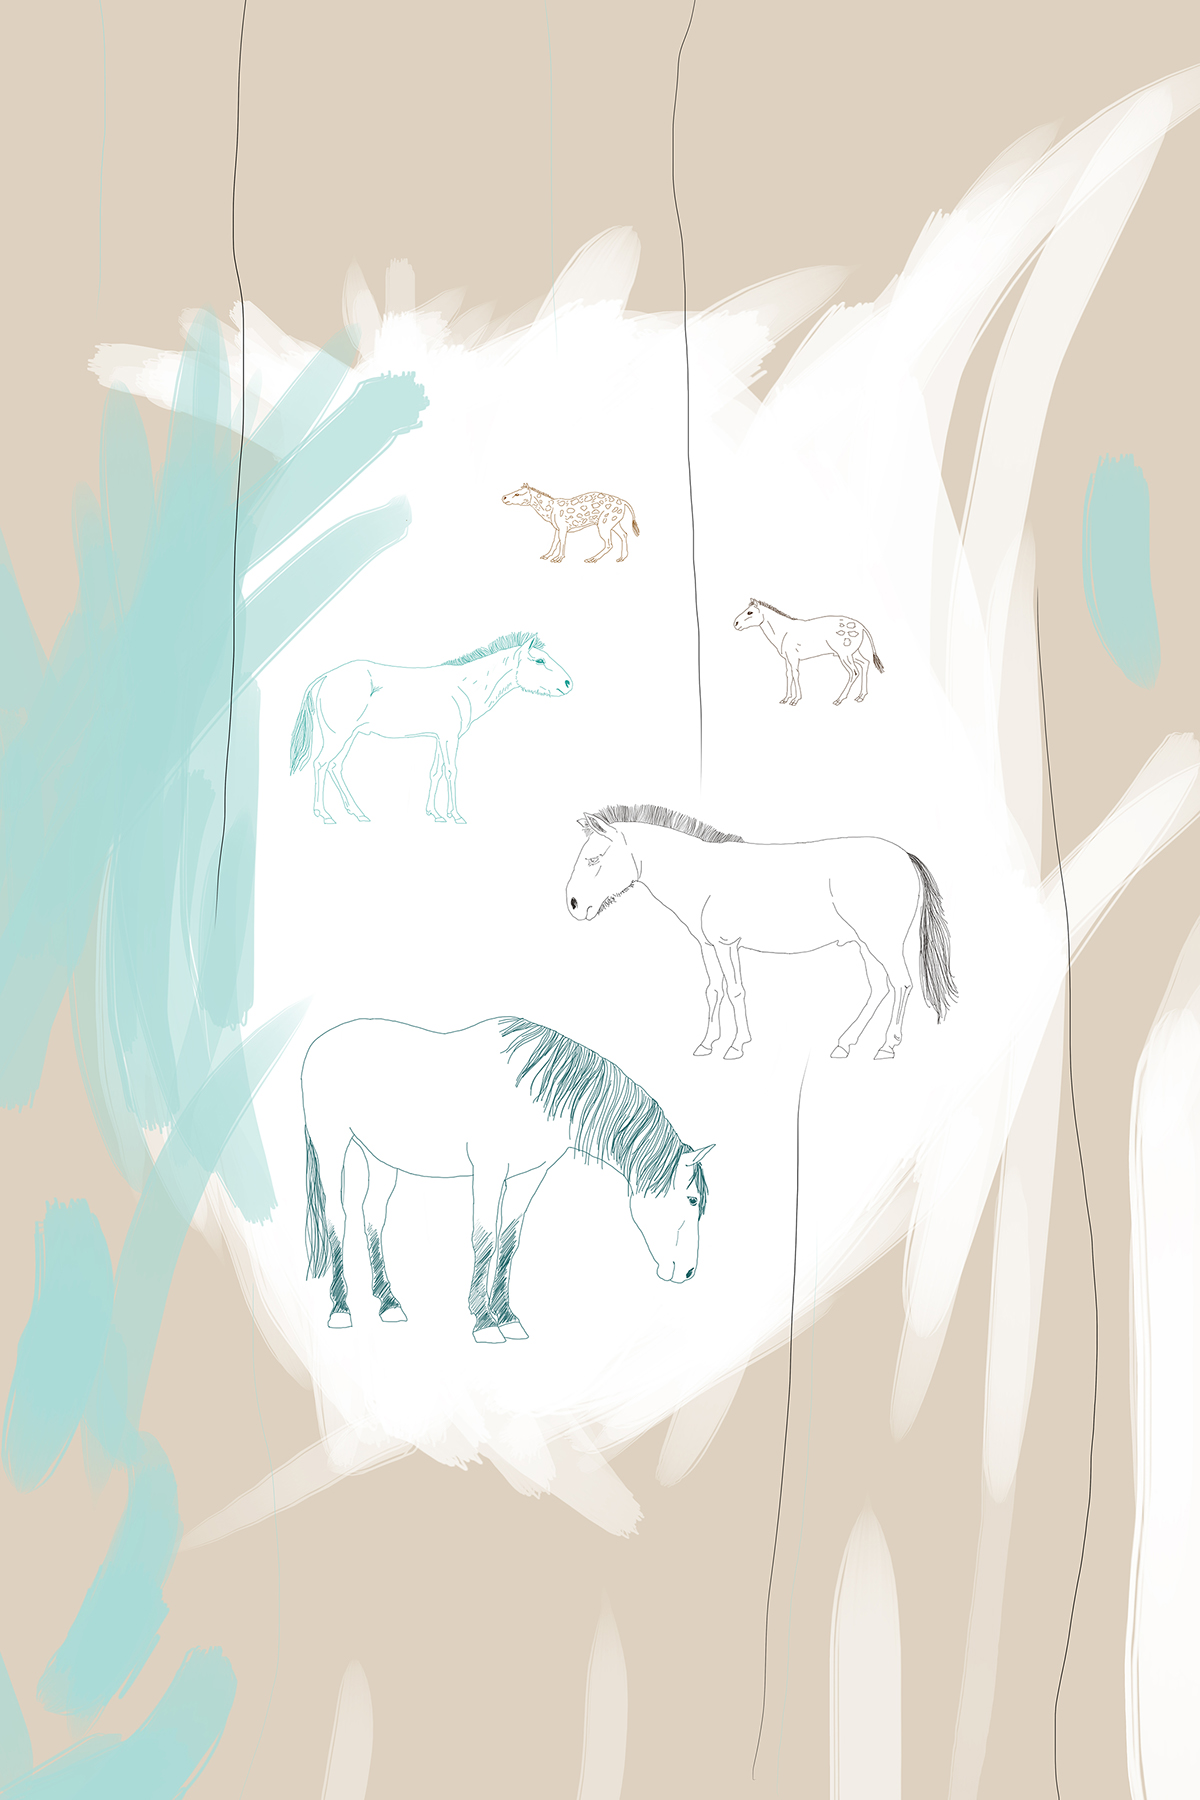 horses history greek polo hittite chariots evolution Mio Cid